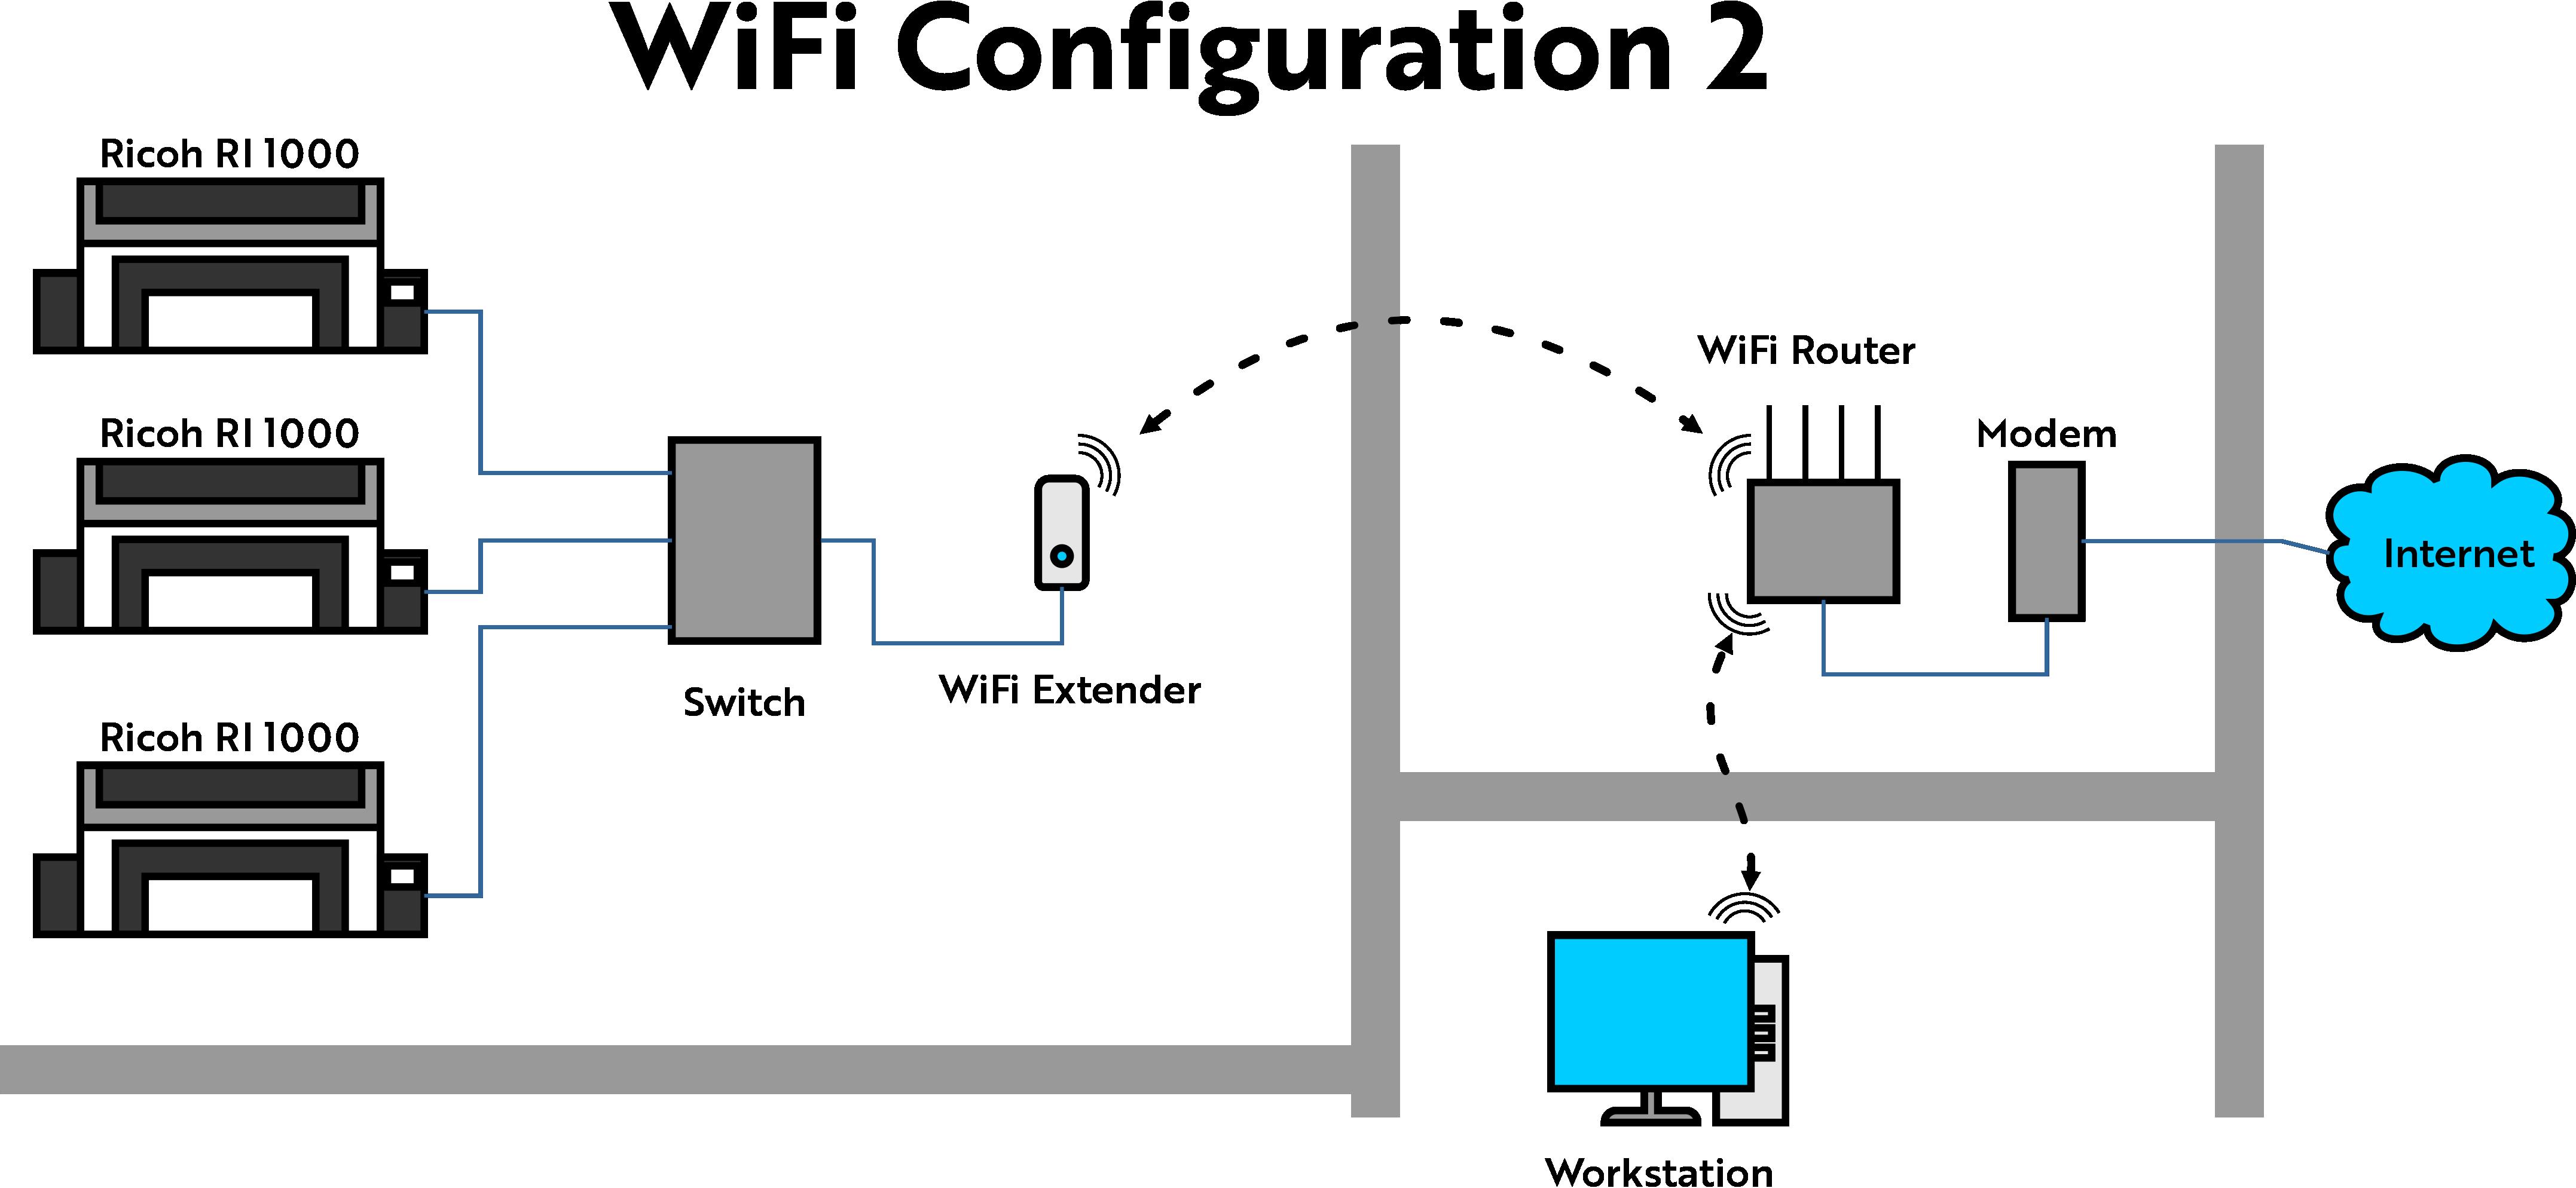 WiFi Network Configuration 2